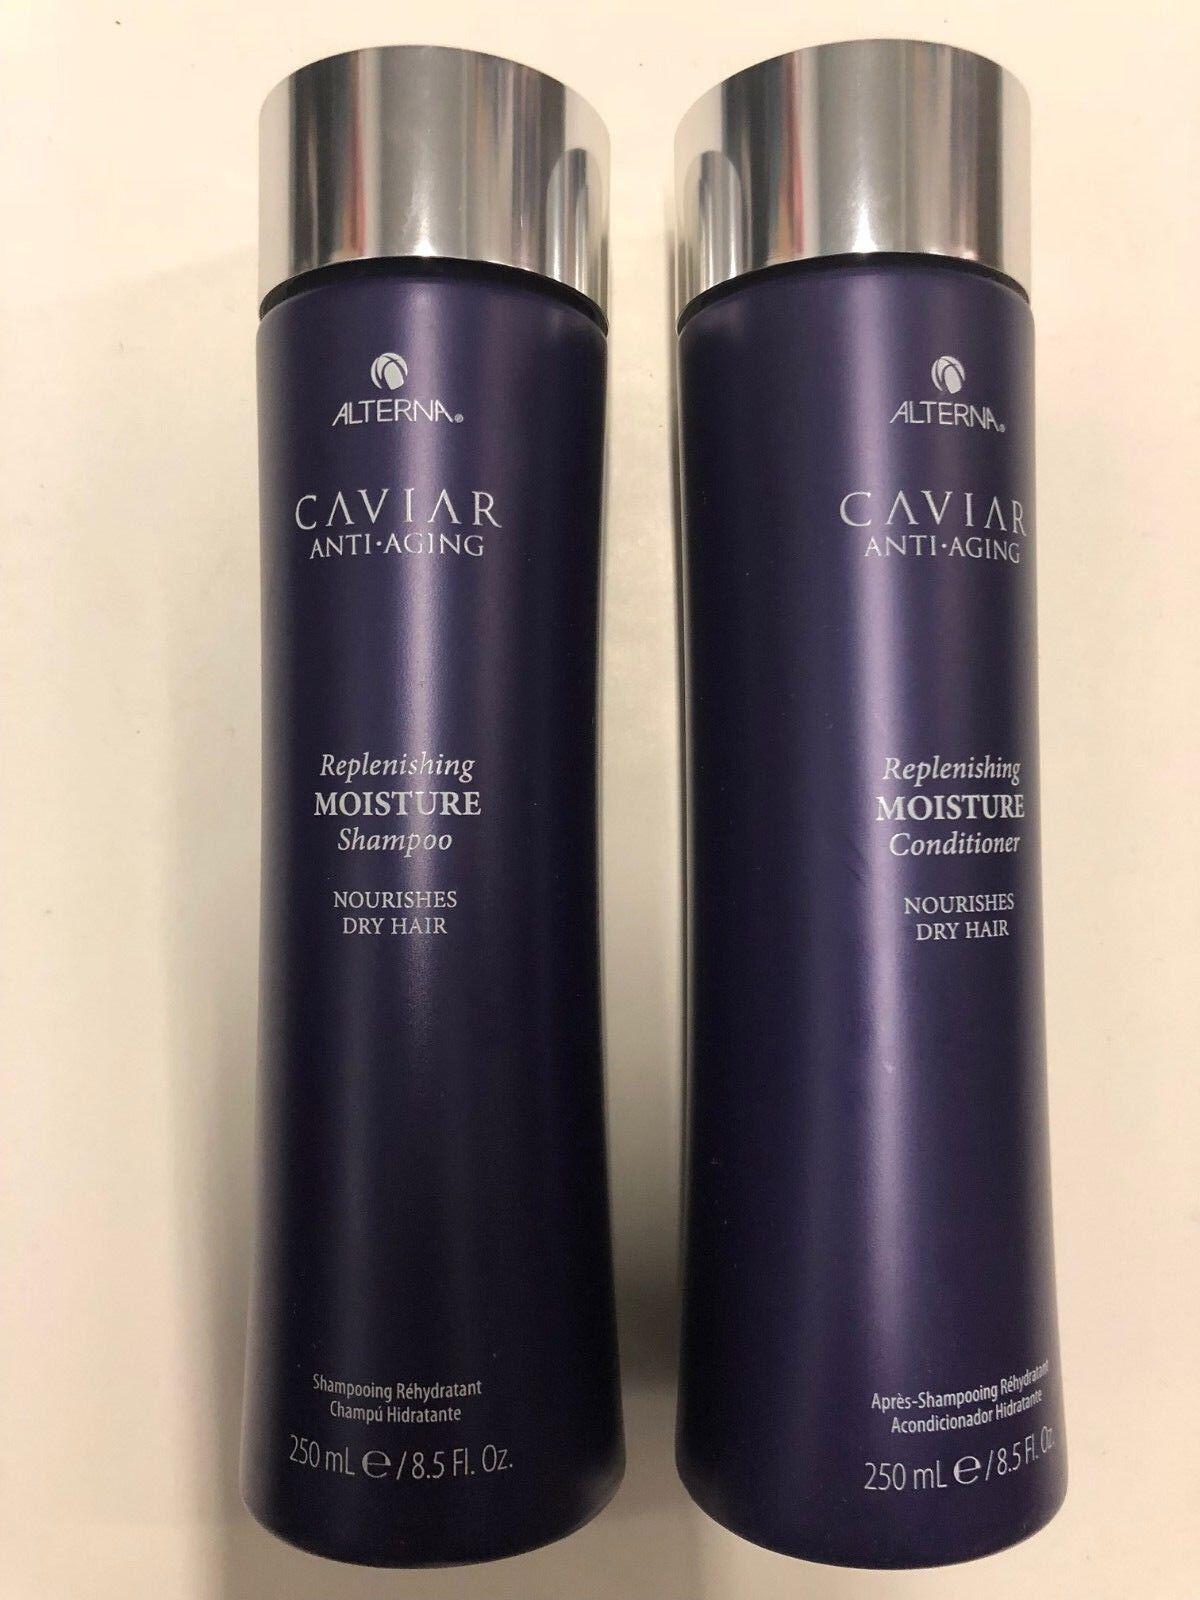 NEW Alterna Caviar Anti-Aging Replenishing Moisture Duo 8.5